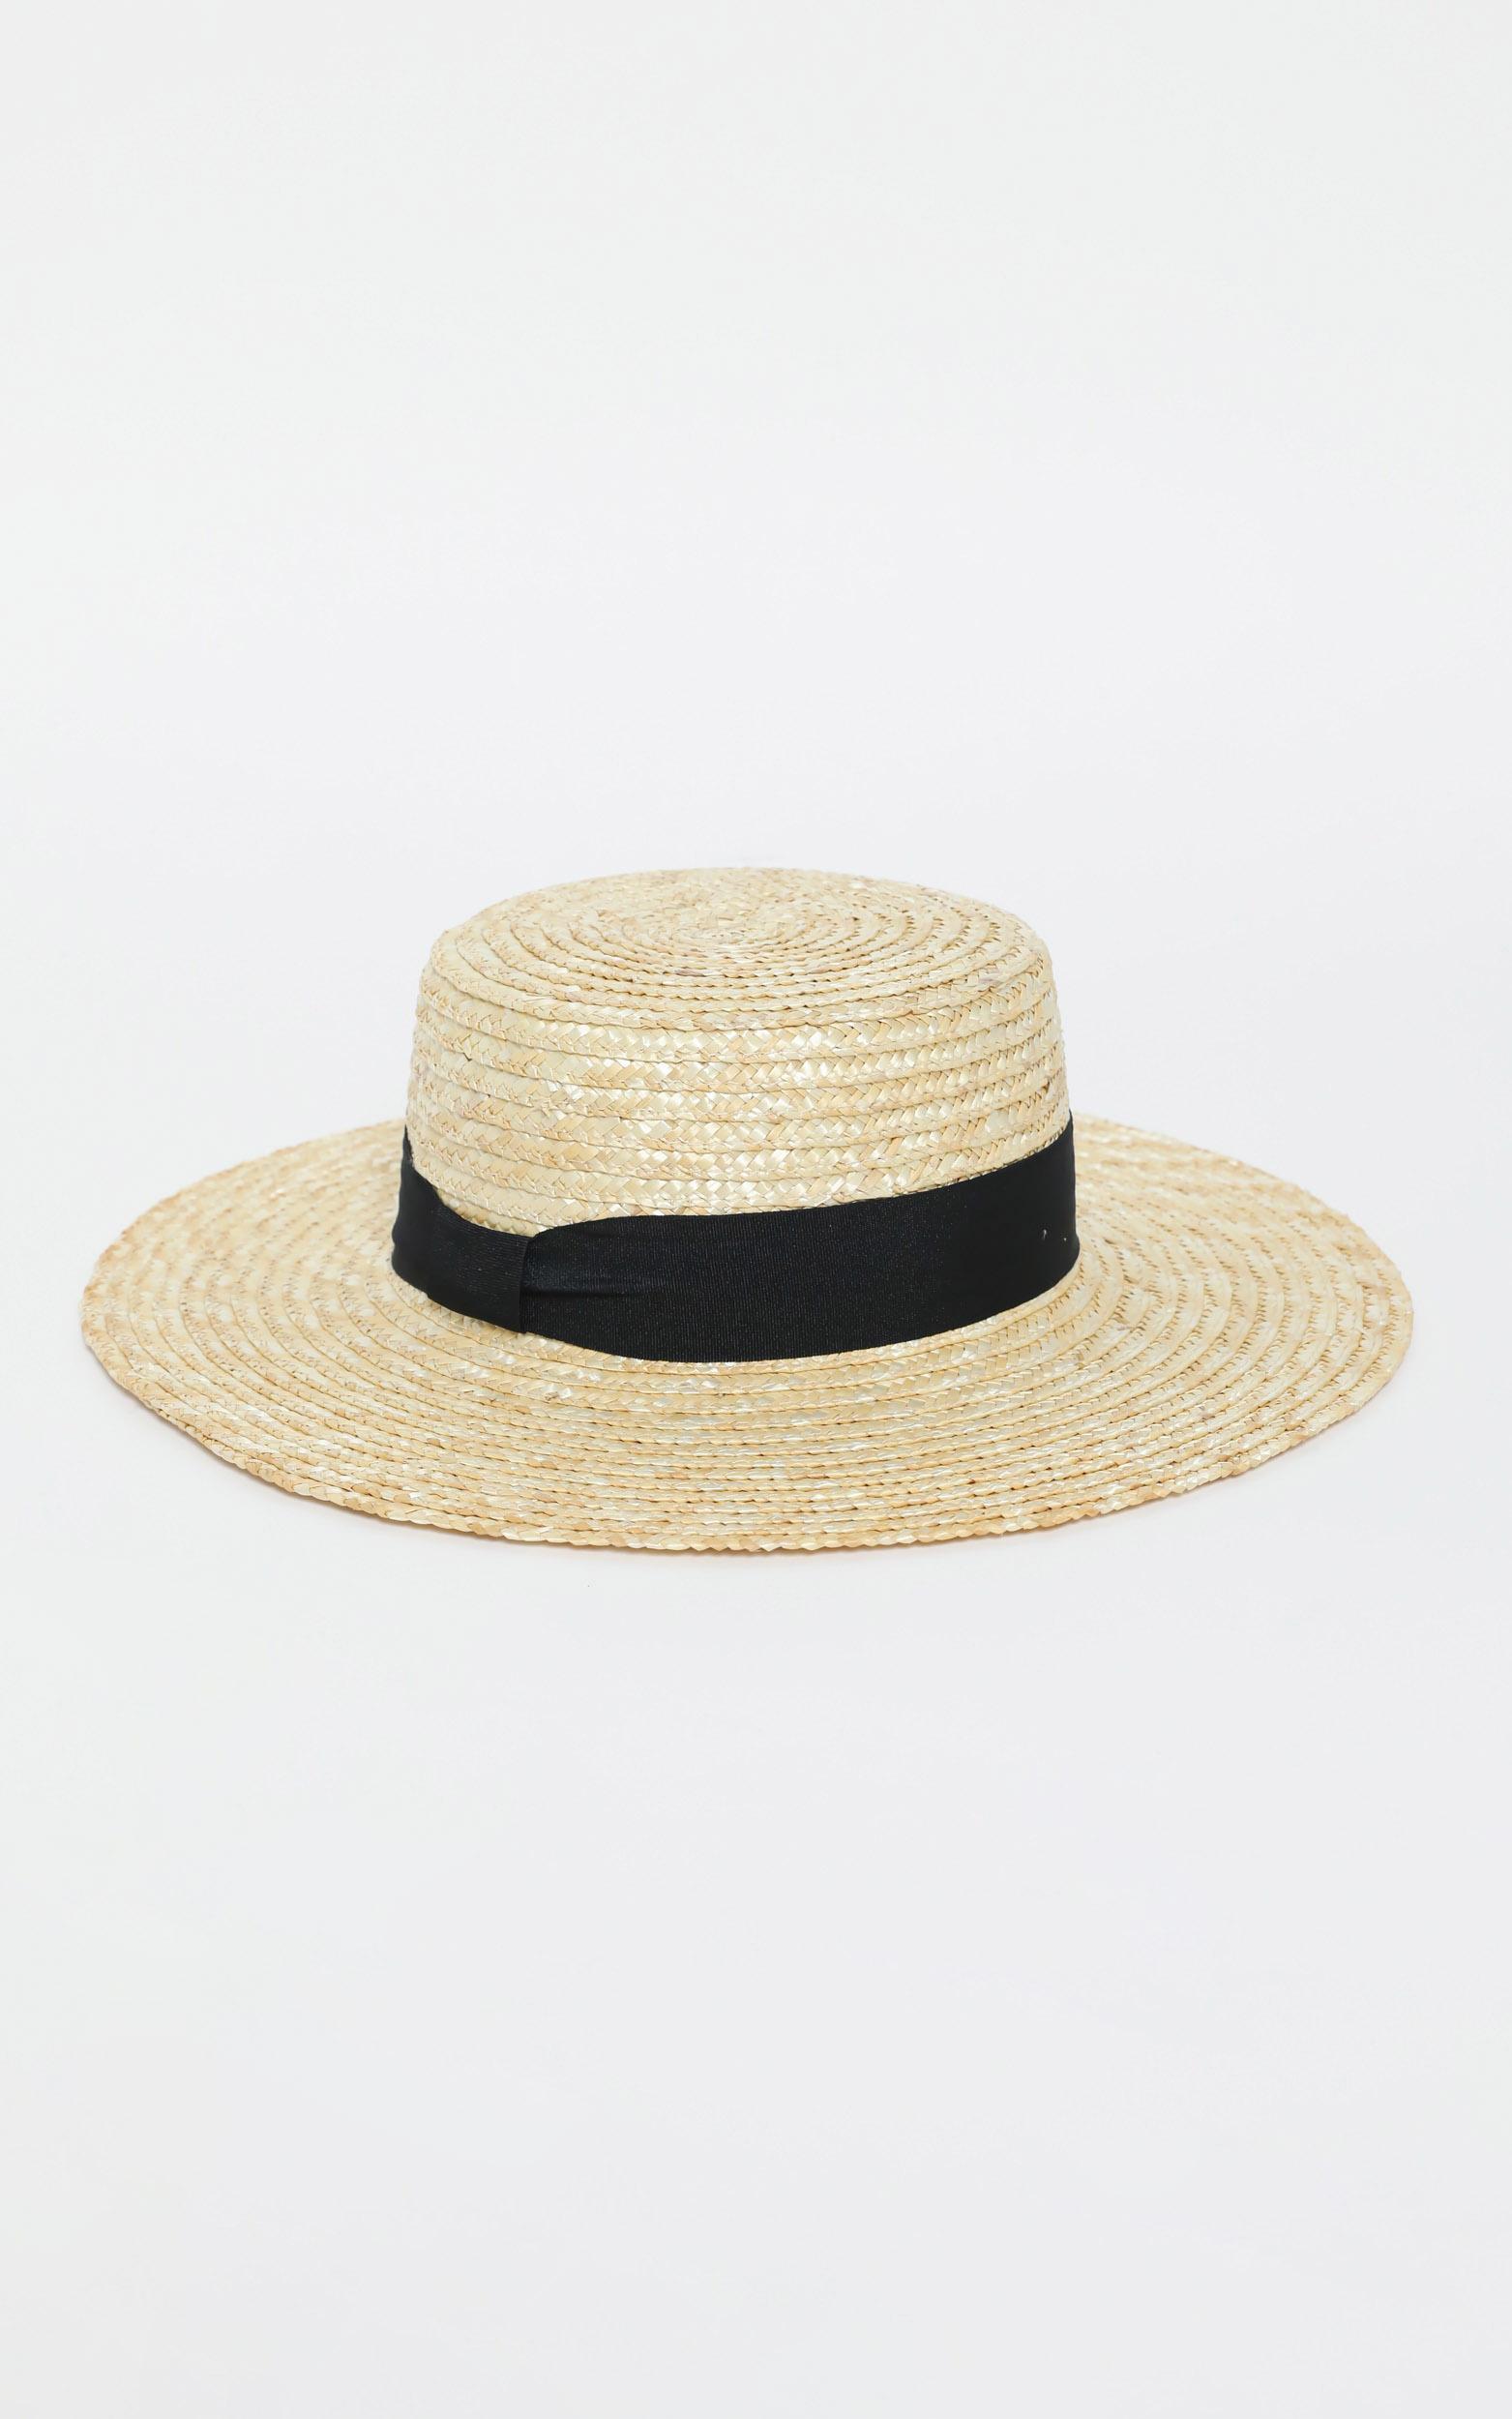 Destine Straw Hat in Beige, , hi-res image number null